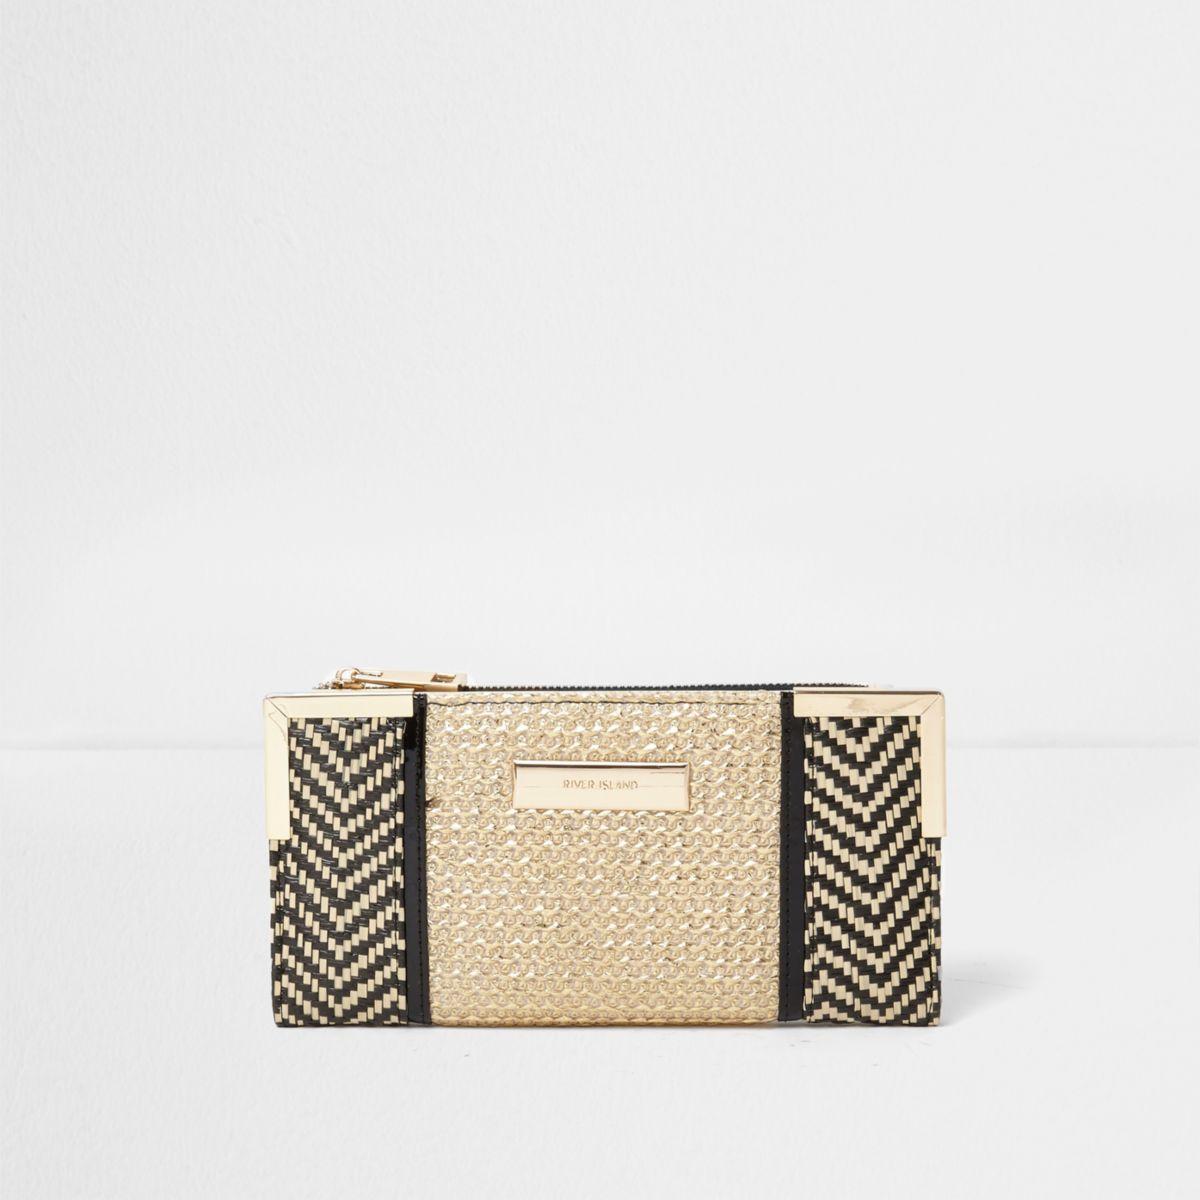 Goudkleurig/zwarte geweven smalle portemonnee